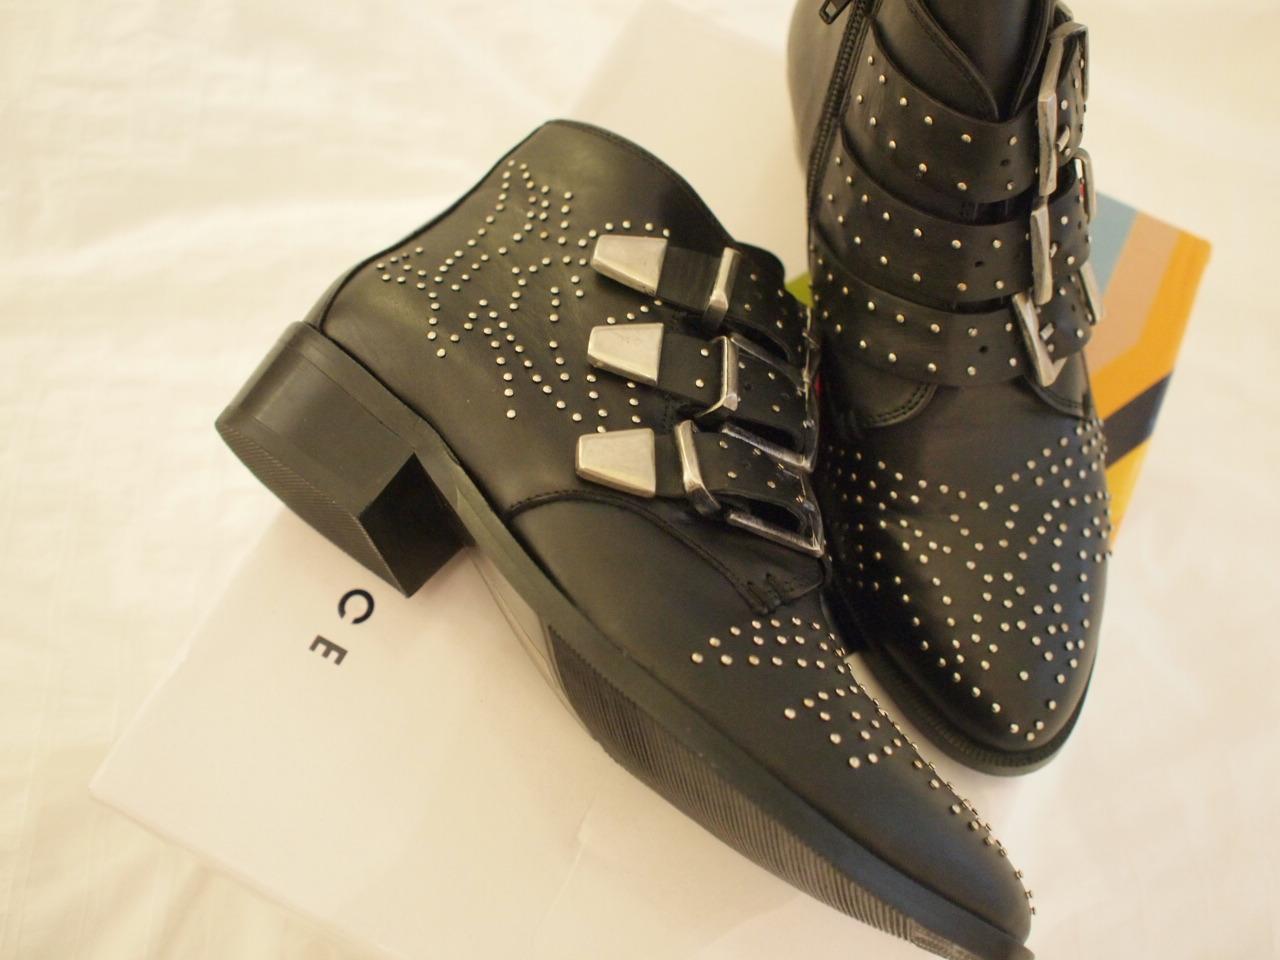 Brand New Office Nighthawk Studded Boots